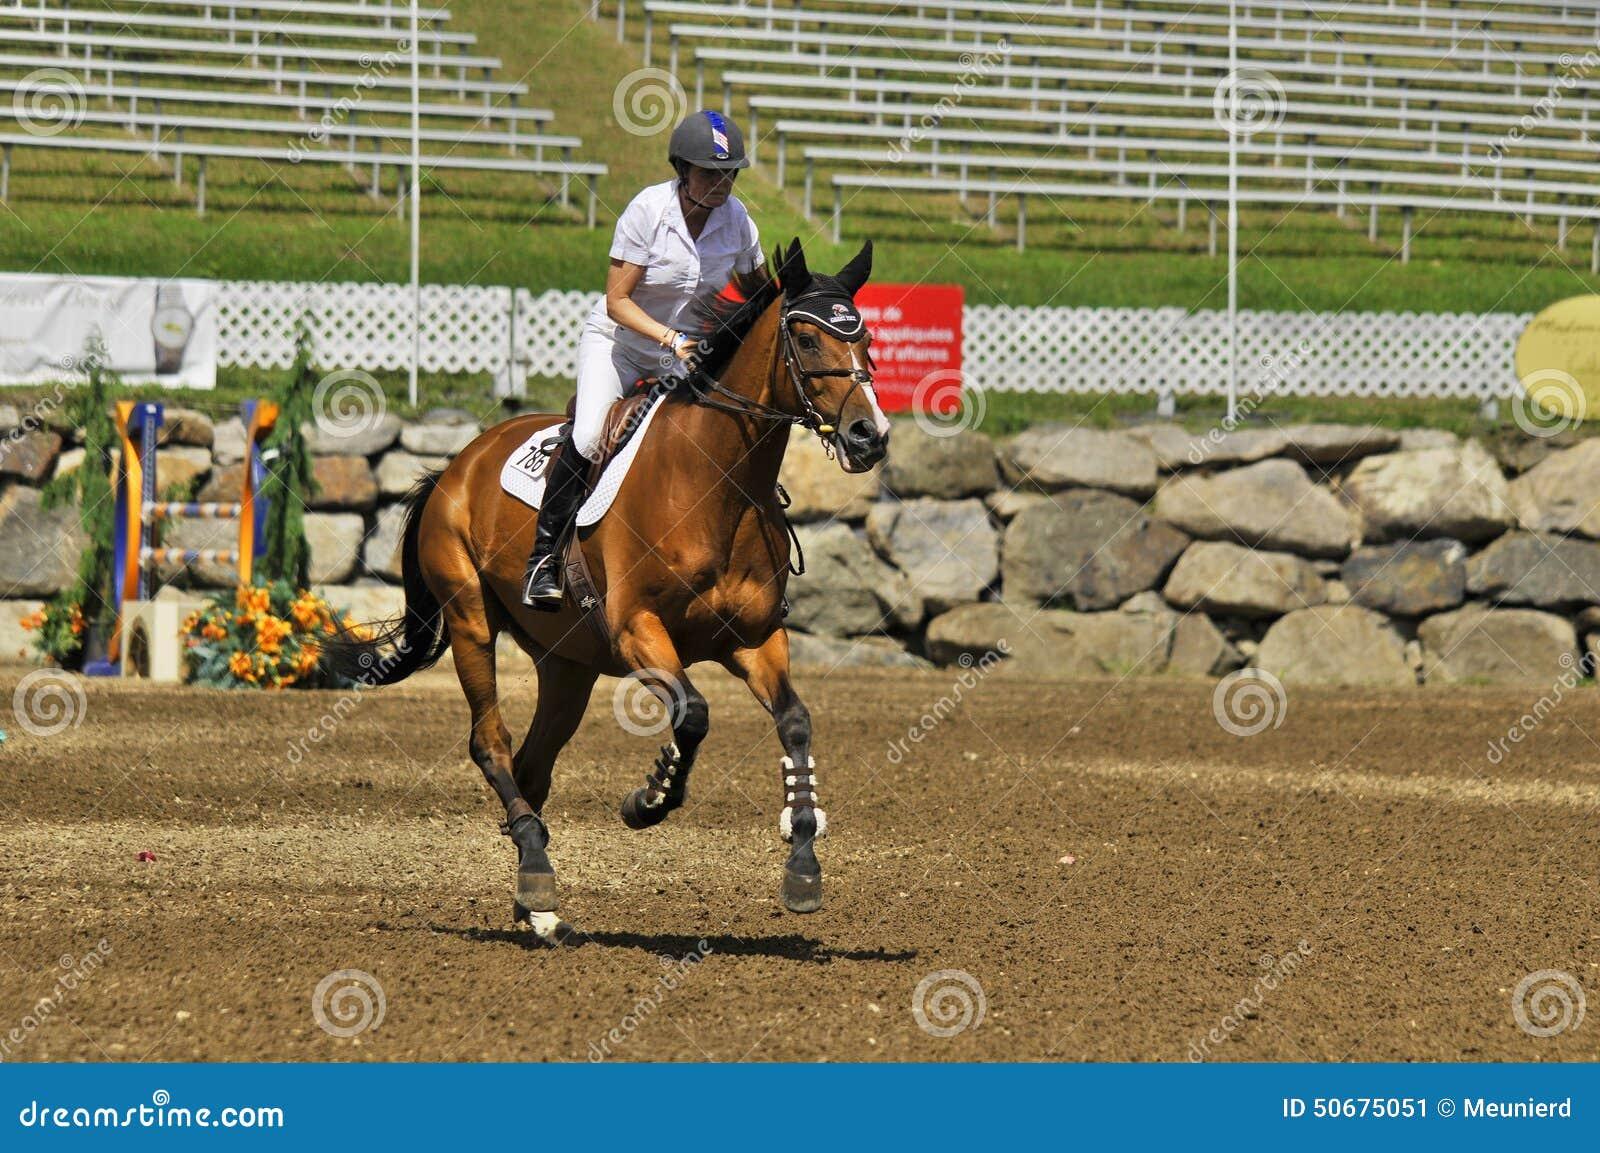 Download 国际BROMONT 编辑类照片. 图片 包括有 飞跃, 障碍, 农场, 空中, 范围, 结算, 7月, 跳接器 - 50675051